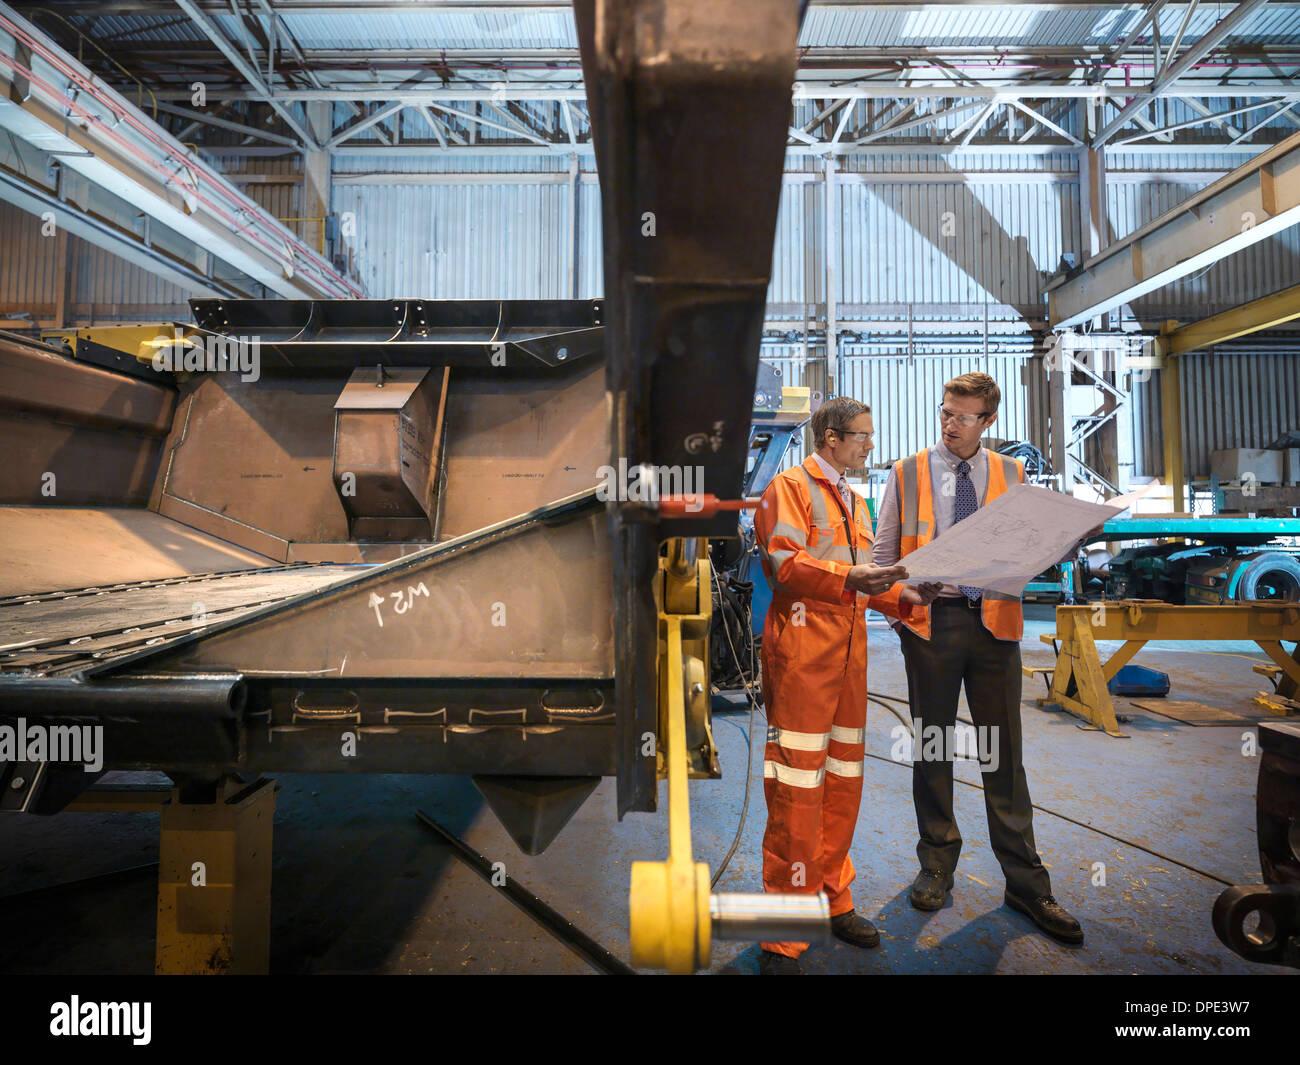 Engineers inspecting engineering drawings in factory - Stock Image